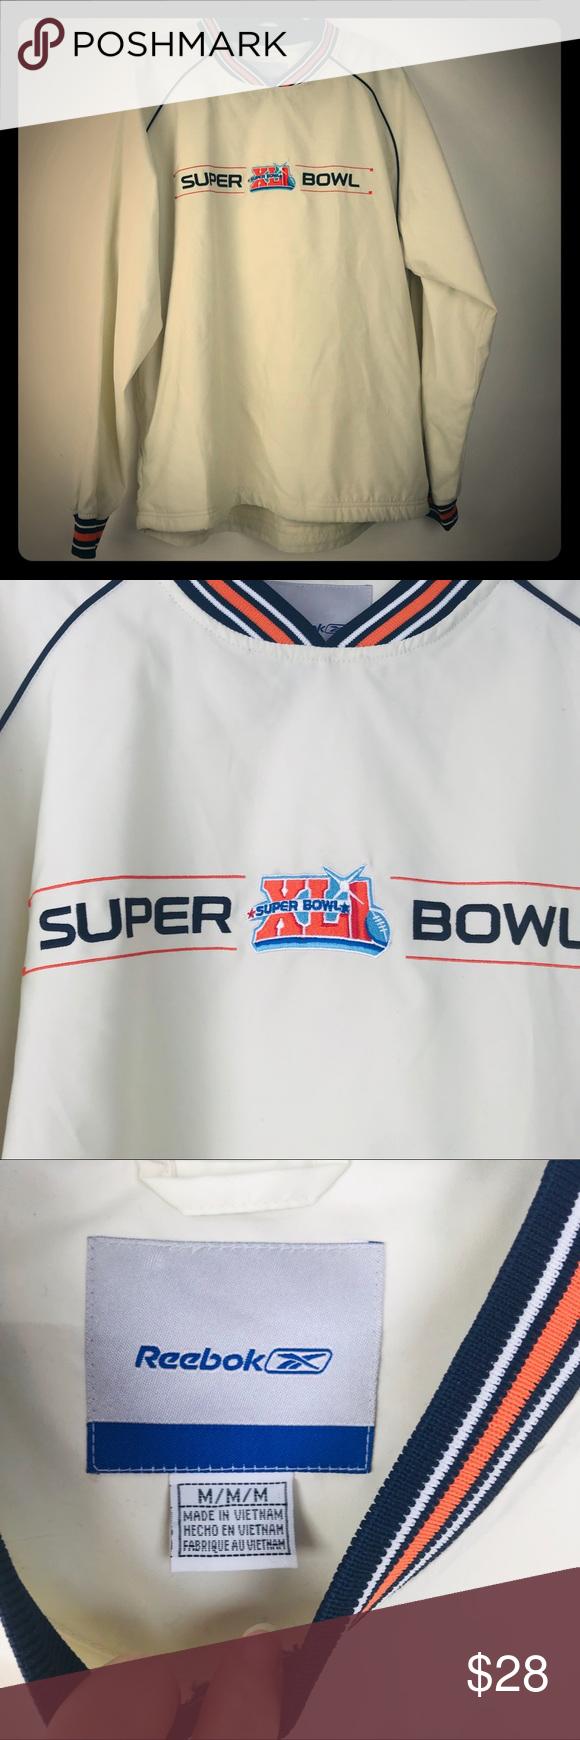 Reebok Super Bowl XLI Beige Windbreaker M Reebok Super Bowl XLI Beige Windbreake..., #beige #Bowl #Reebok #Super #SuperBowl2019 #SuperBowldecorations #SuperBowlfood #SuperBowlfunny #SuperBowlgames #SuperBowlnfl #SuperBowloutfit #SuperBowlparty #SuperBowlquotes #SuperBowlsnacks #Windbreake #Windbreaker #XLI